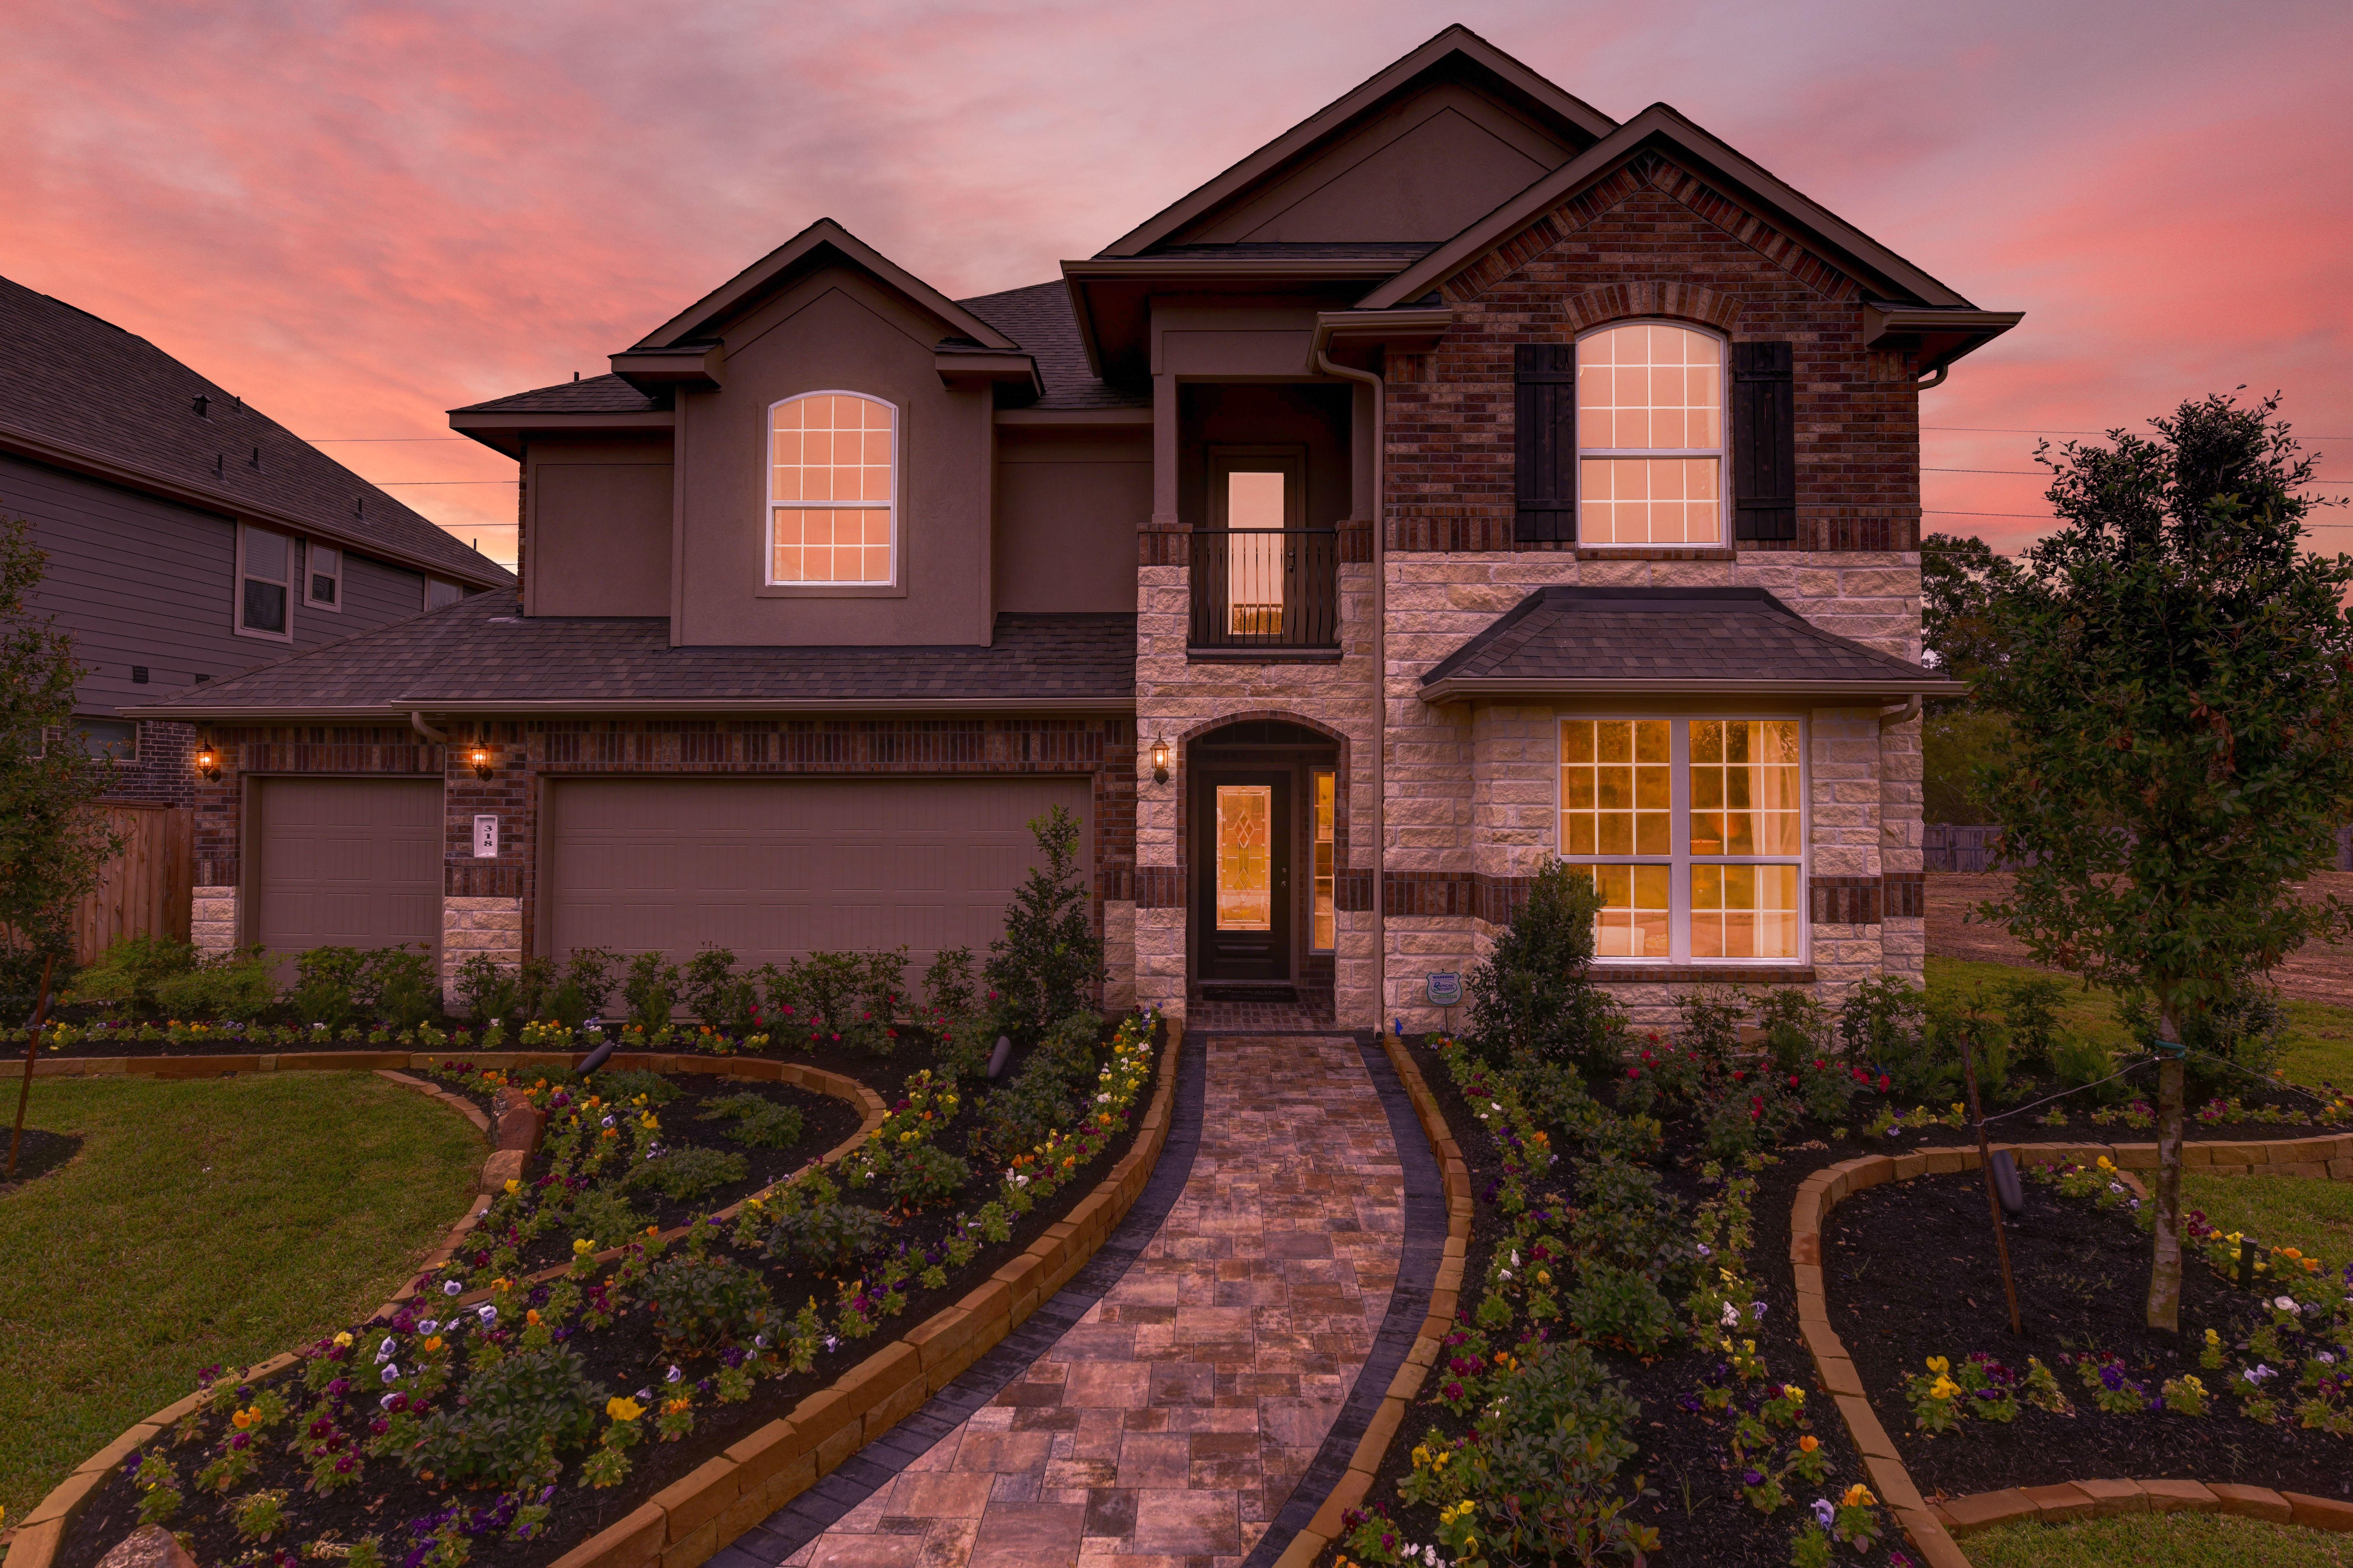 4 Princeton Classic Homes Communities in Missouri City, TX ...